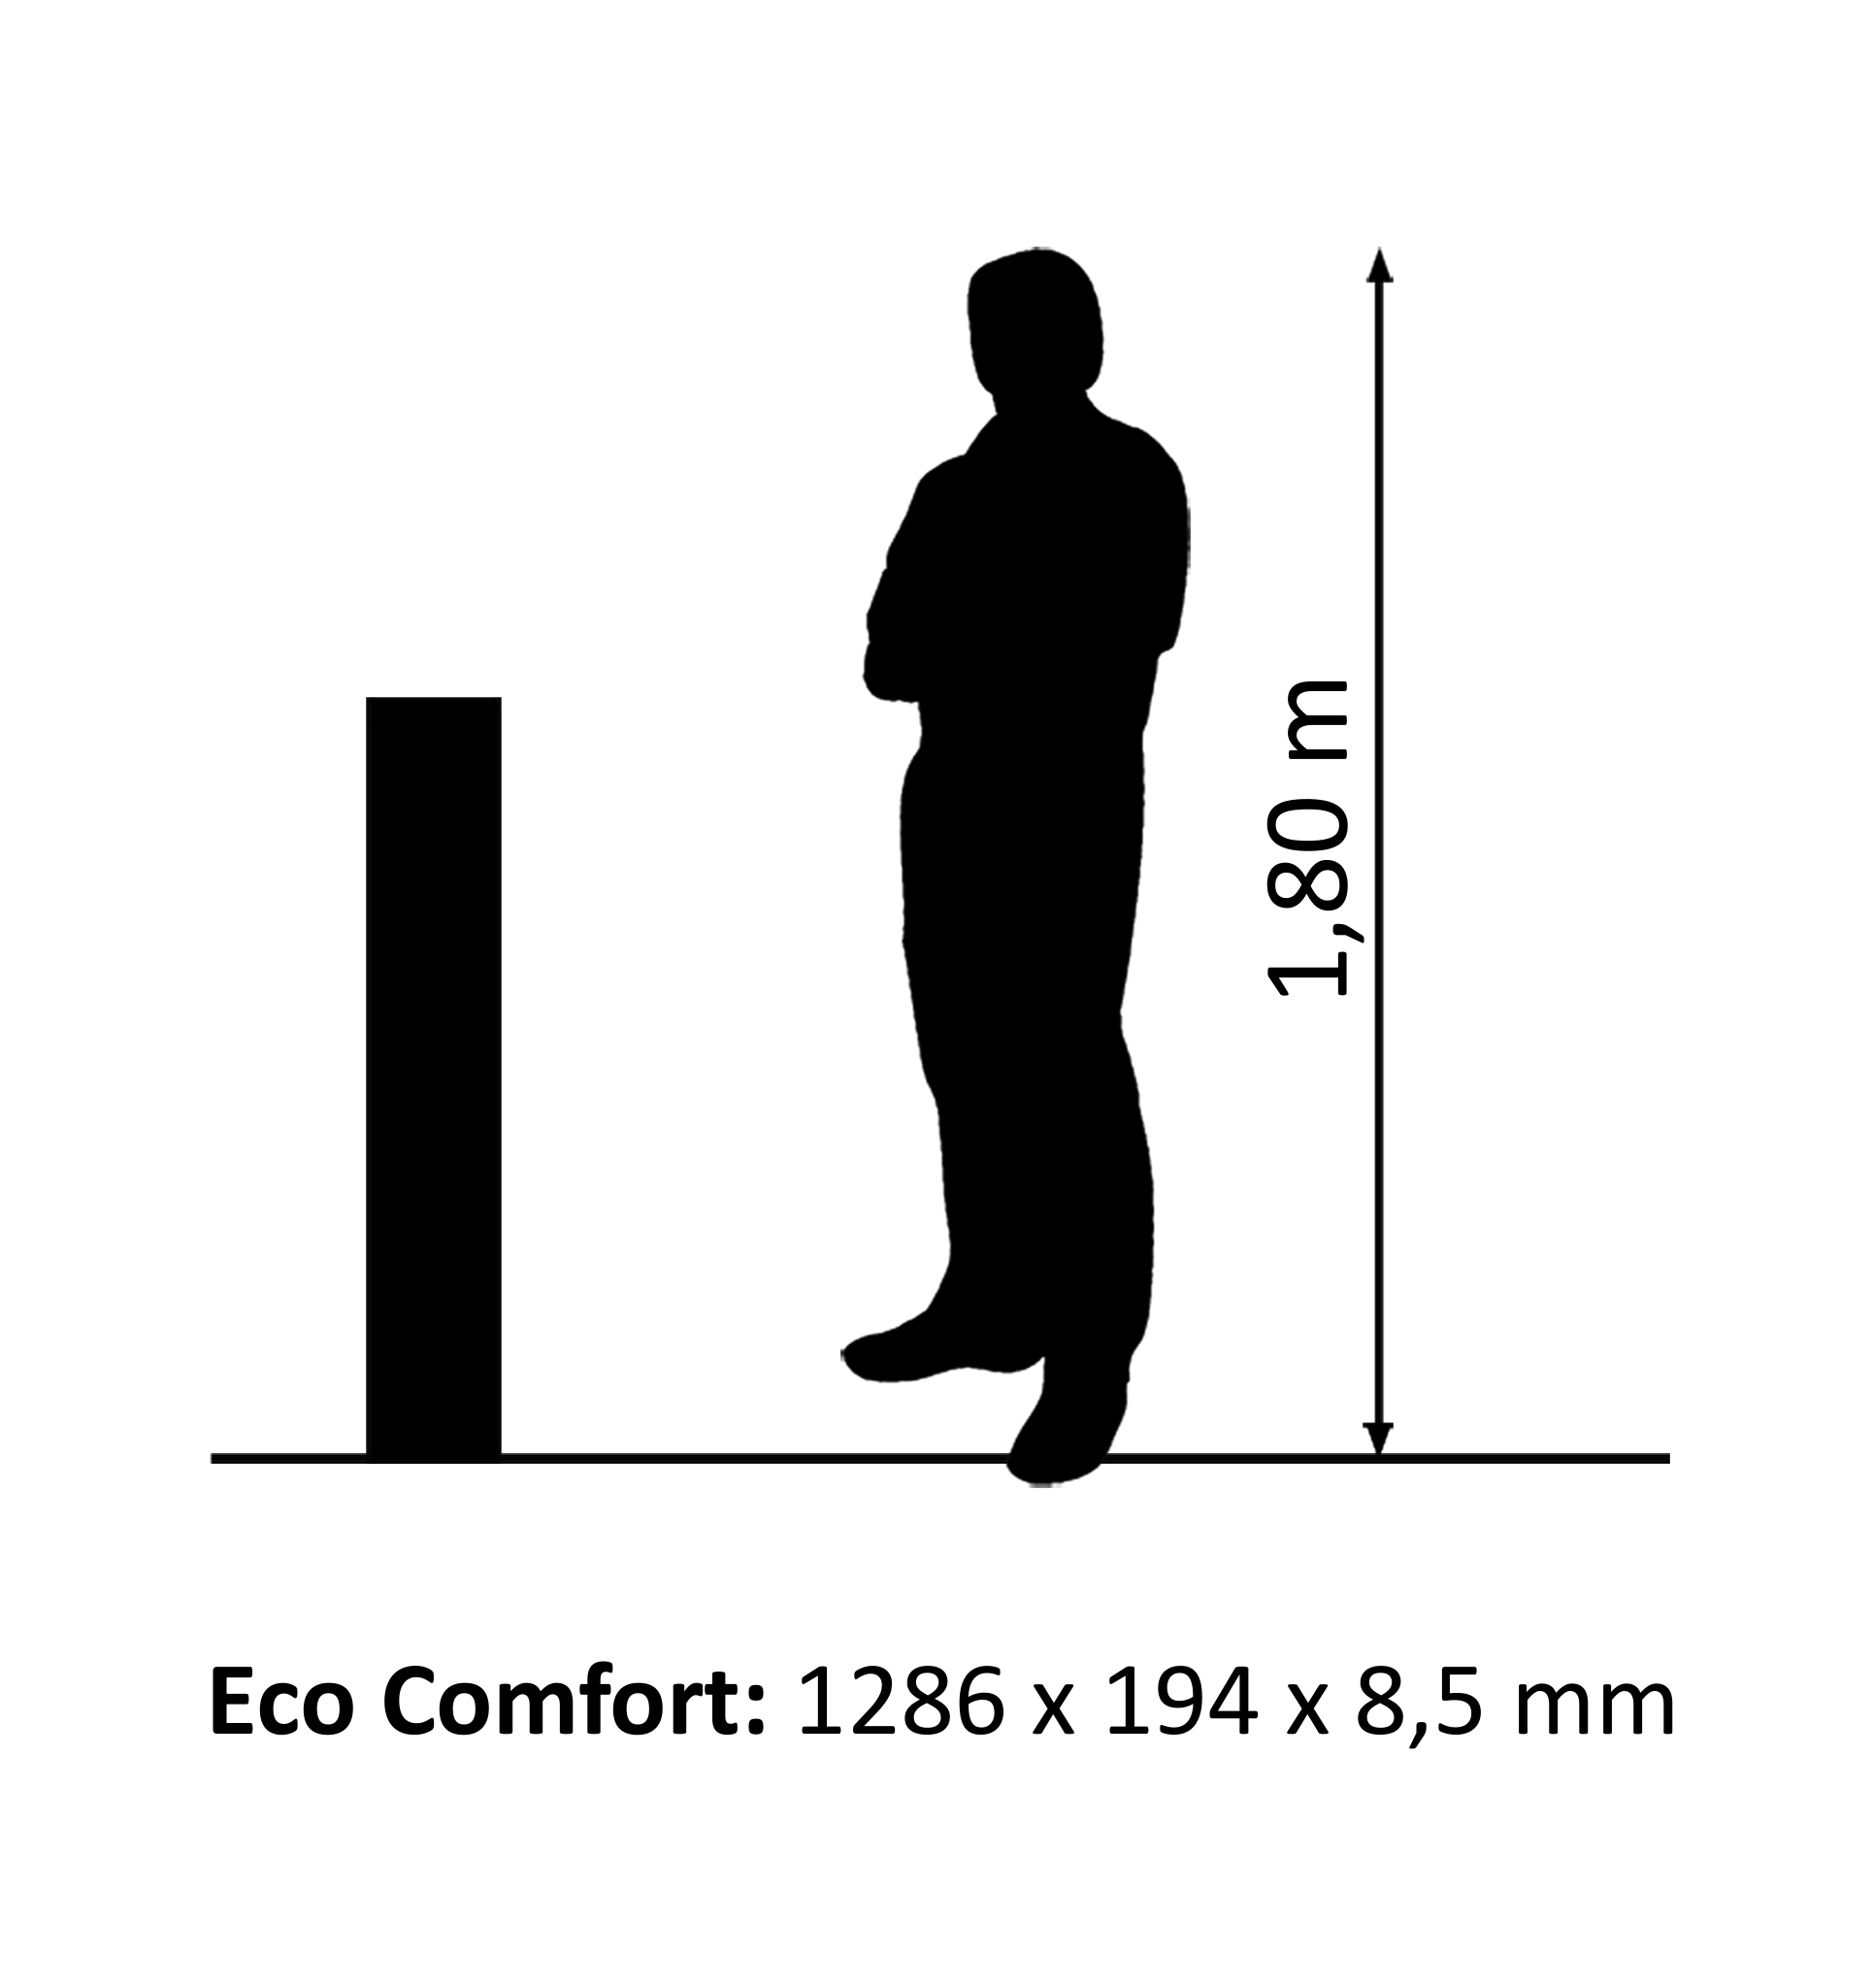 Eco Comfort Venezia Pfahlholz